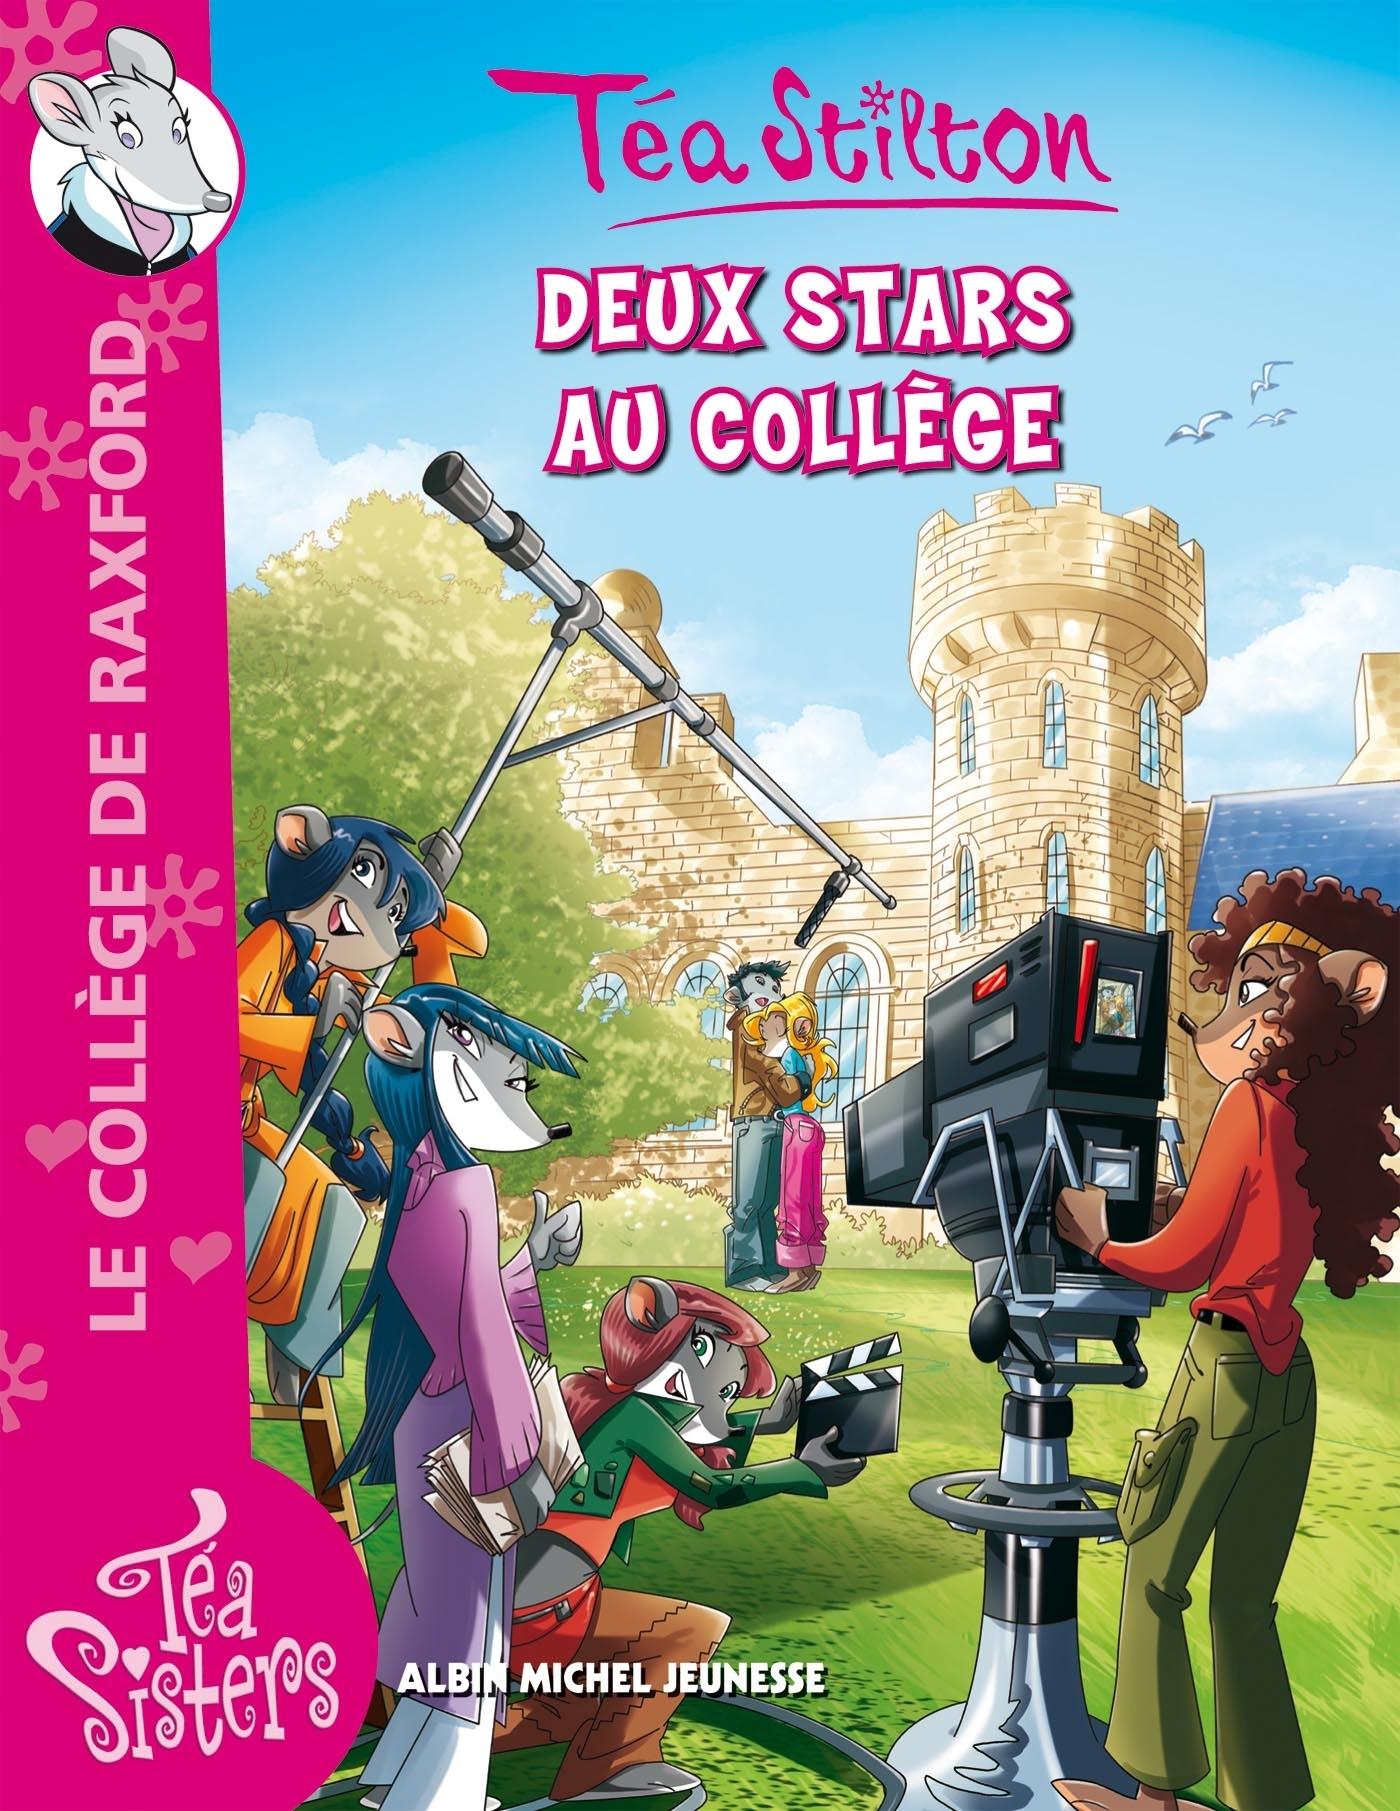 DEUX STARS AU COLLEGE